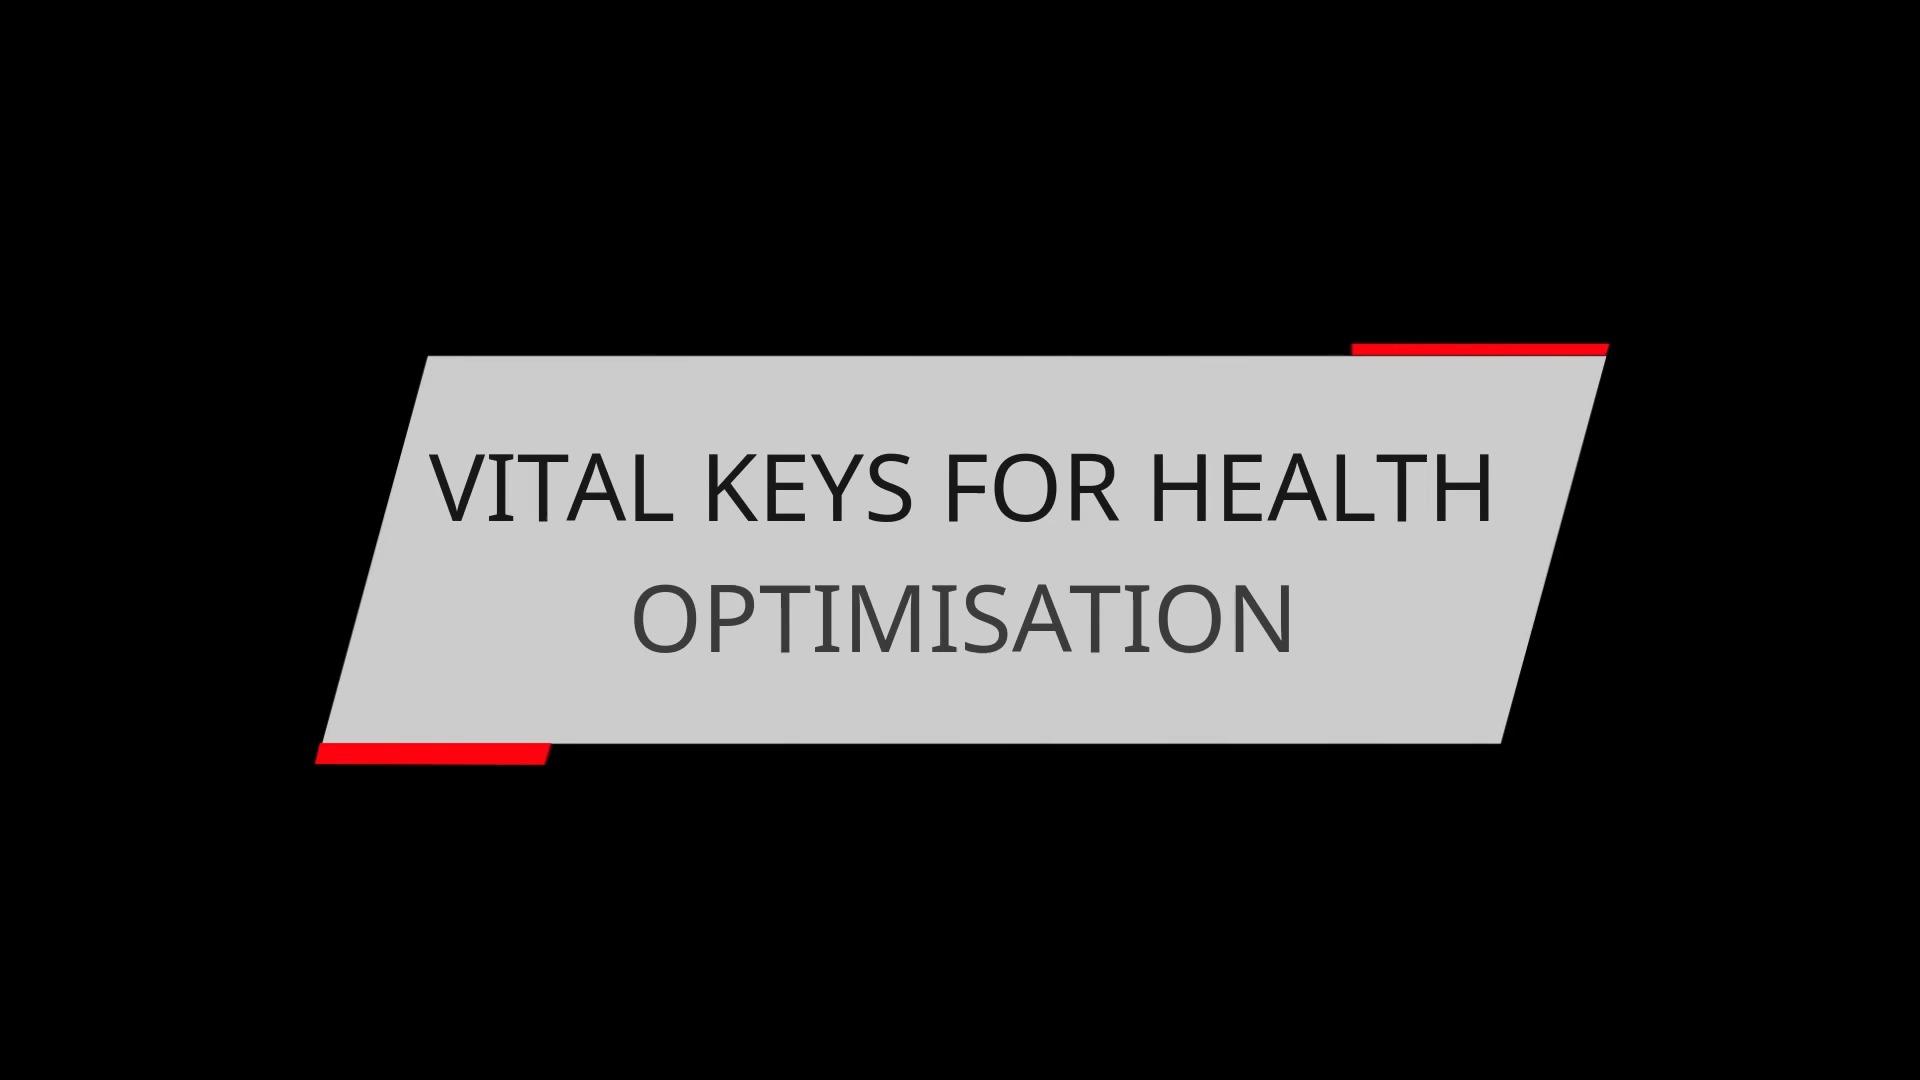 VITAL KEYS FOR HEALTH OPTIMISATION